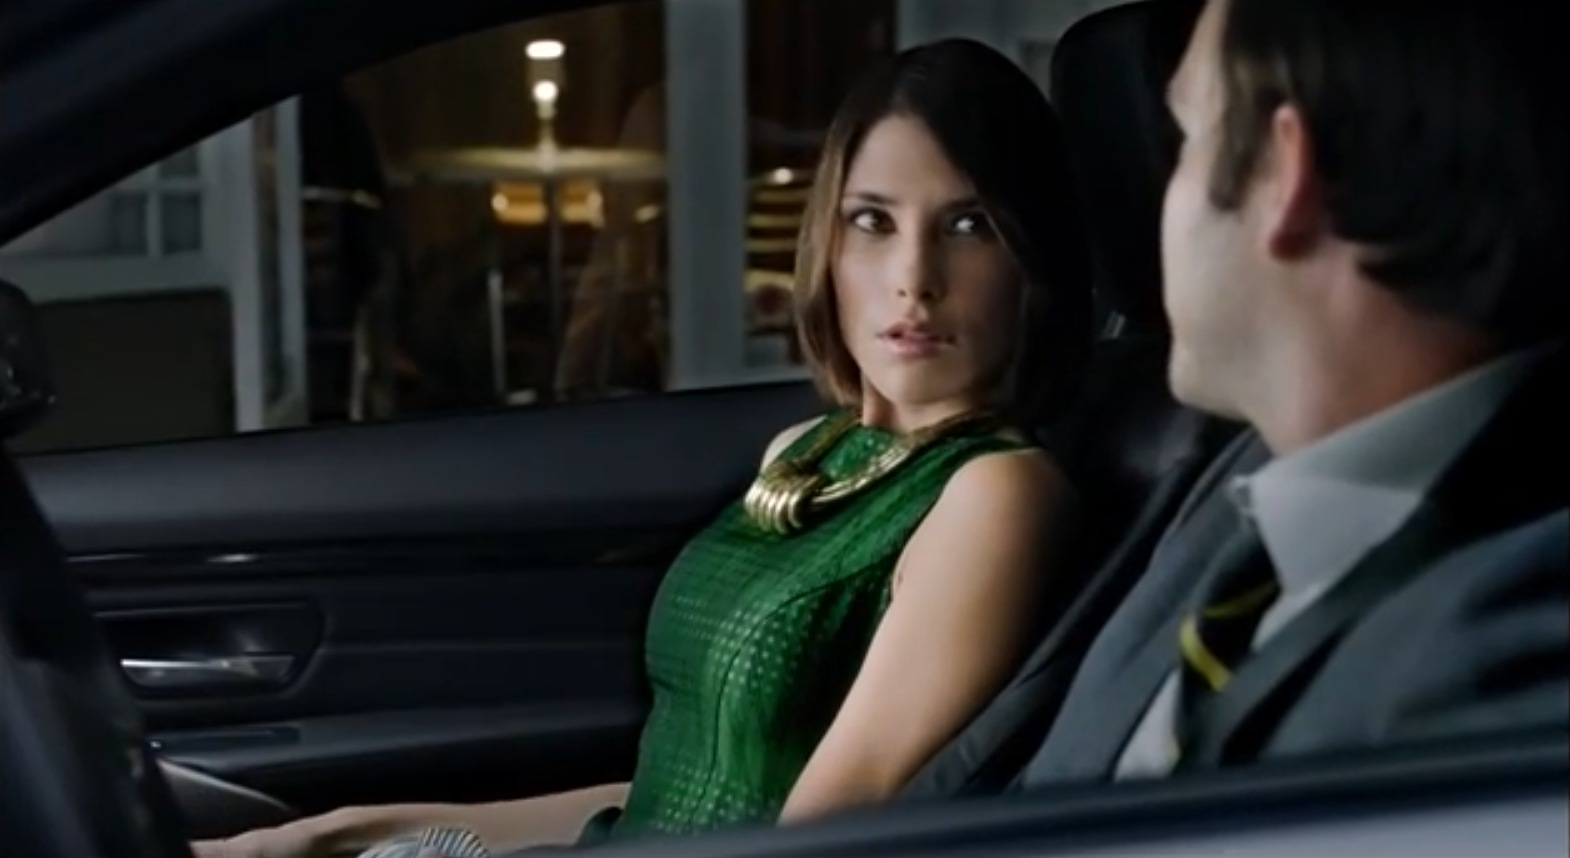 BMW-4er-F32-Werbung-USA-woman-attracted-by-car